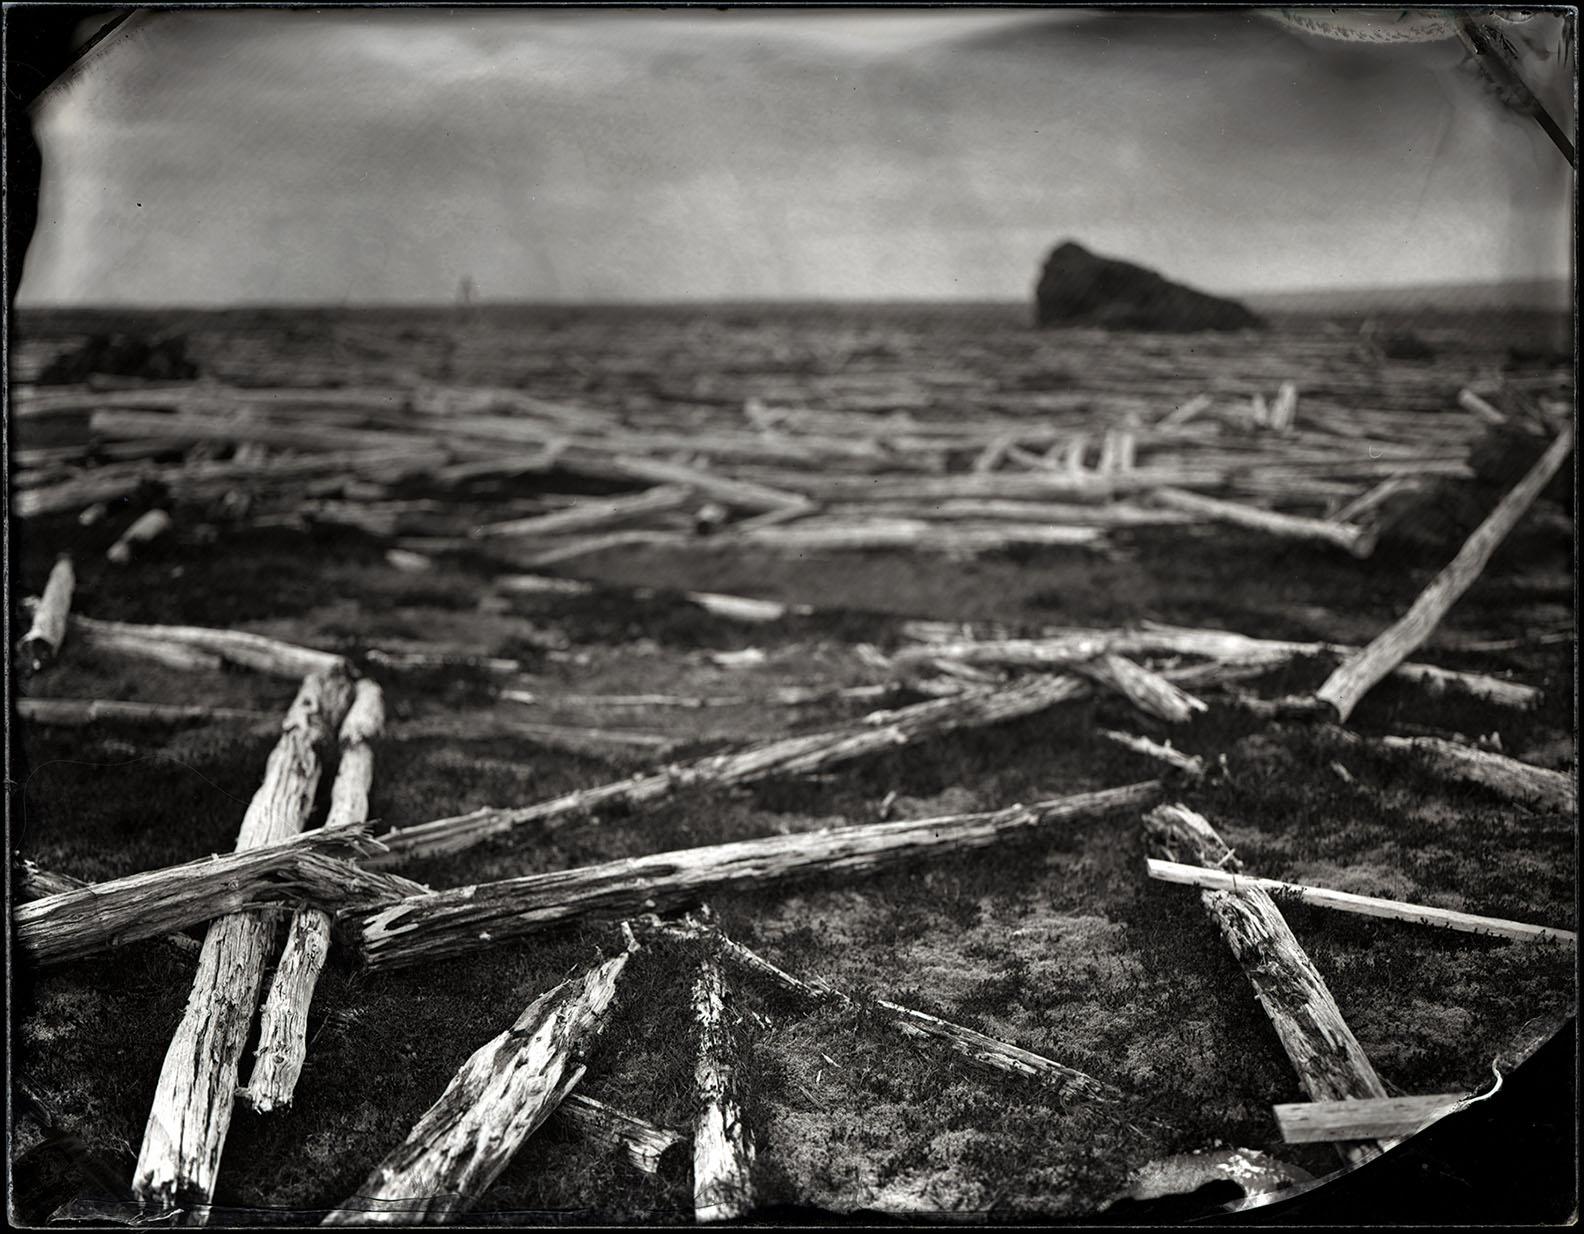 Wood, near Grindavík - By: Karen Stentaford